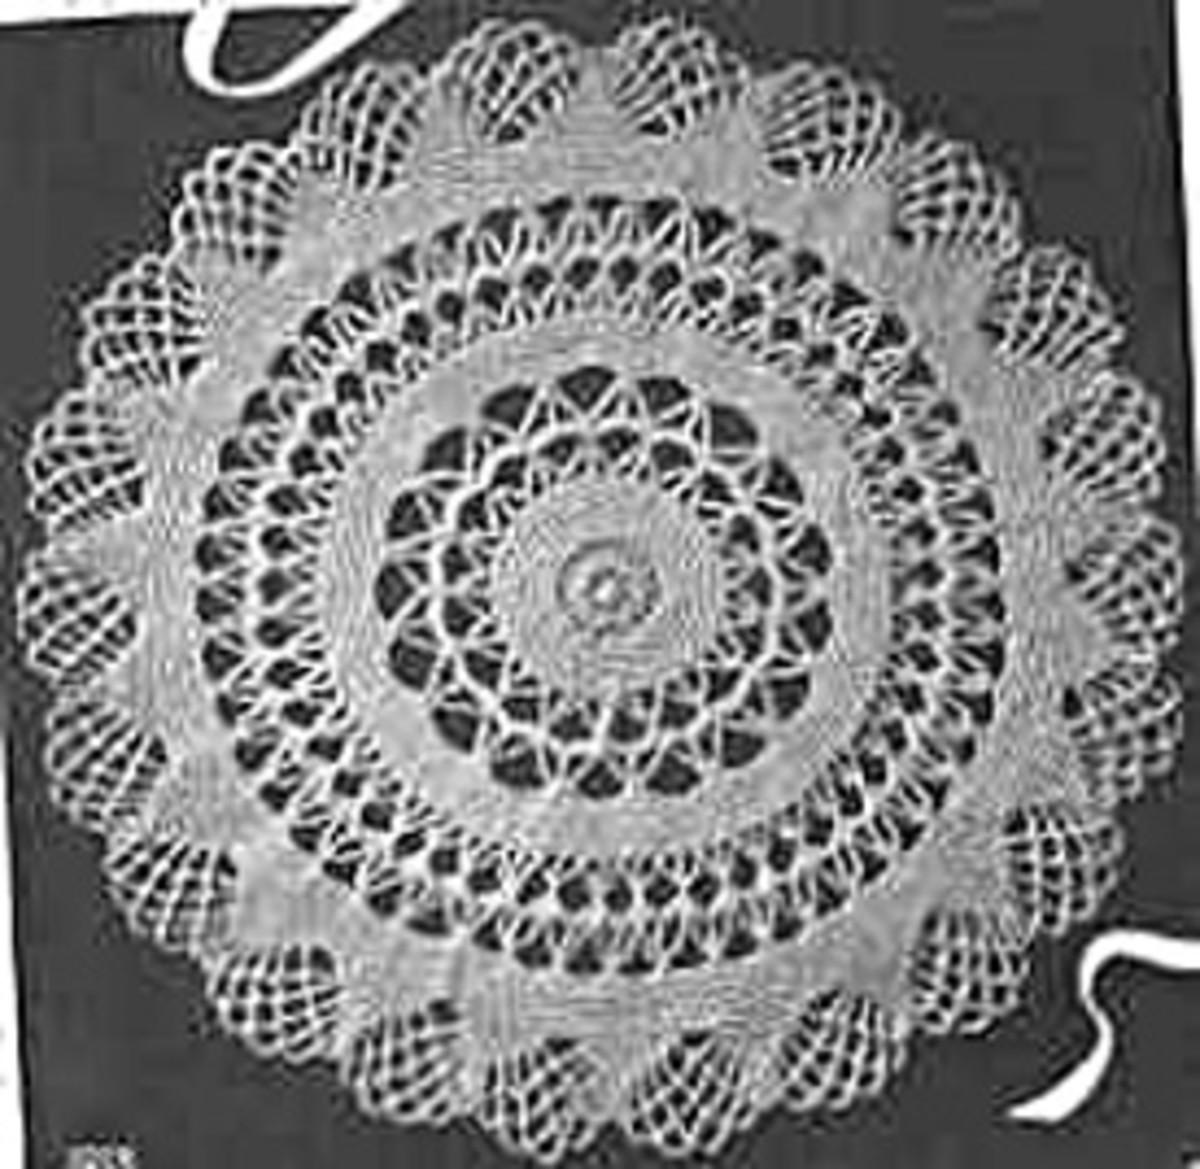 Crocheted 1942 Doily